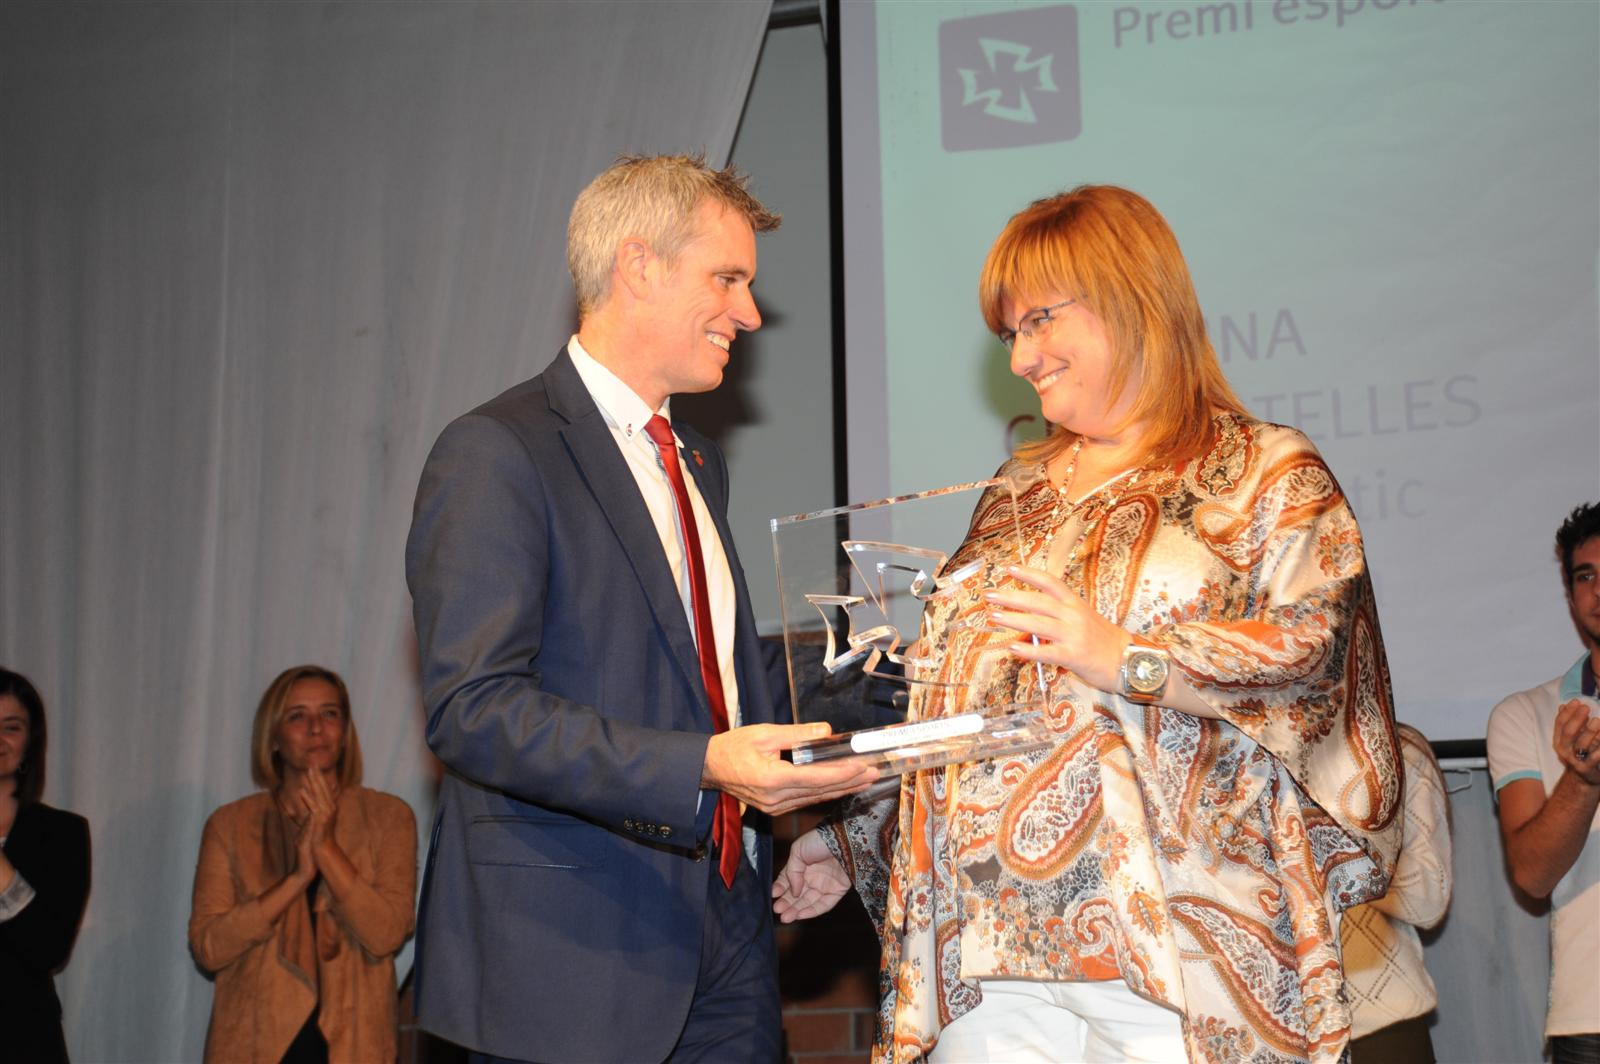 Aina Cid, Premi Esports 2016